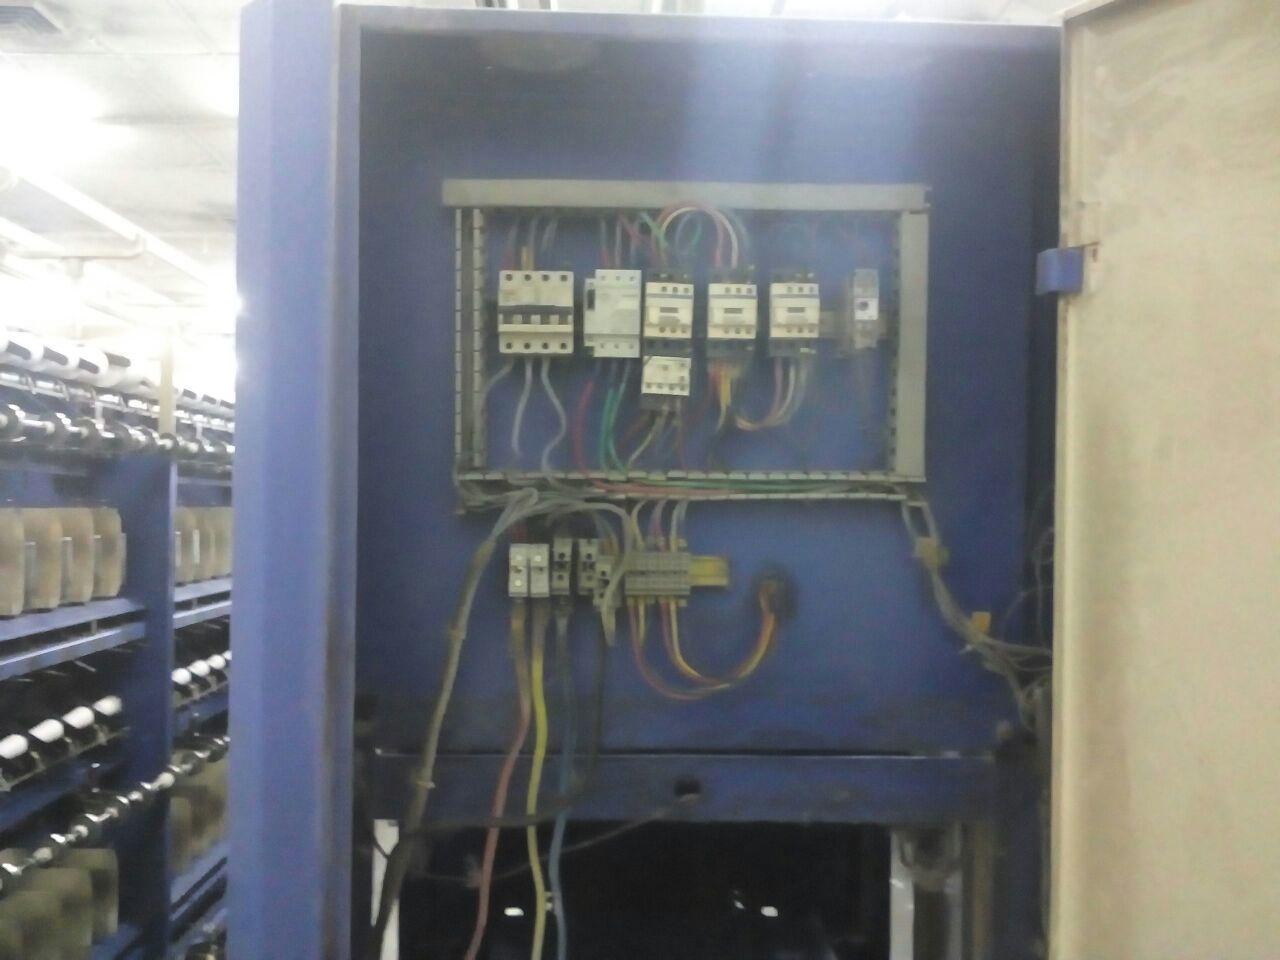 Tfo machine 4